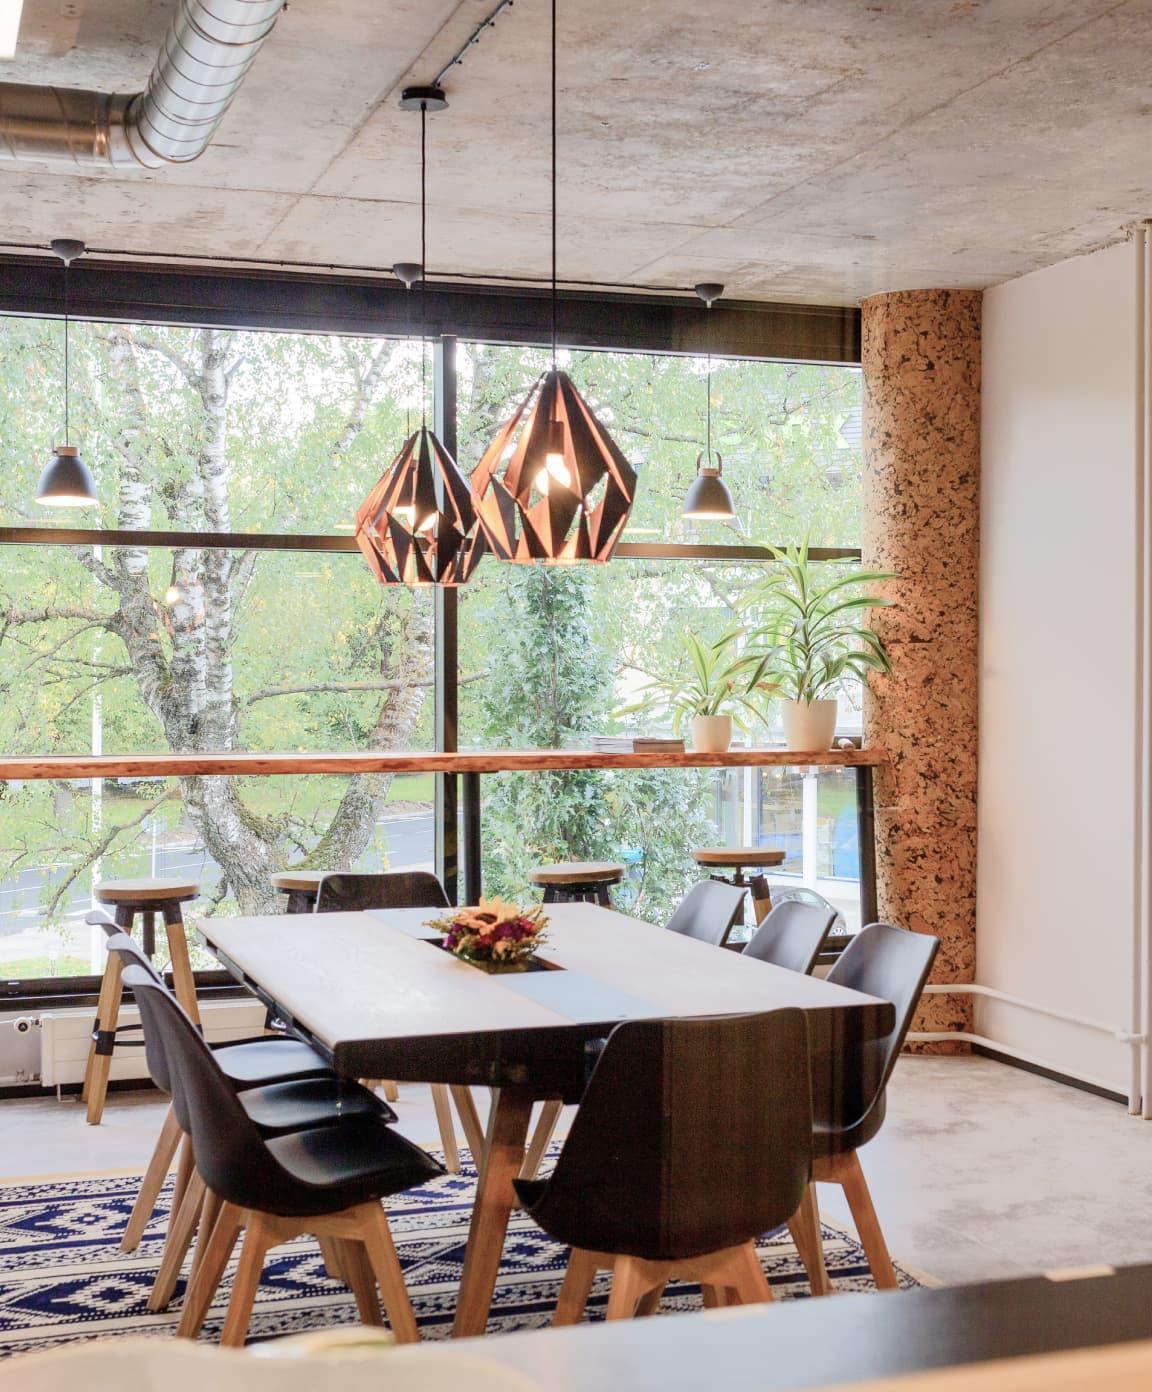 Image of Xolo office